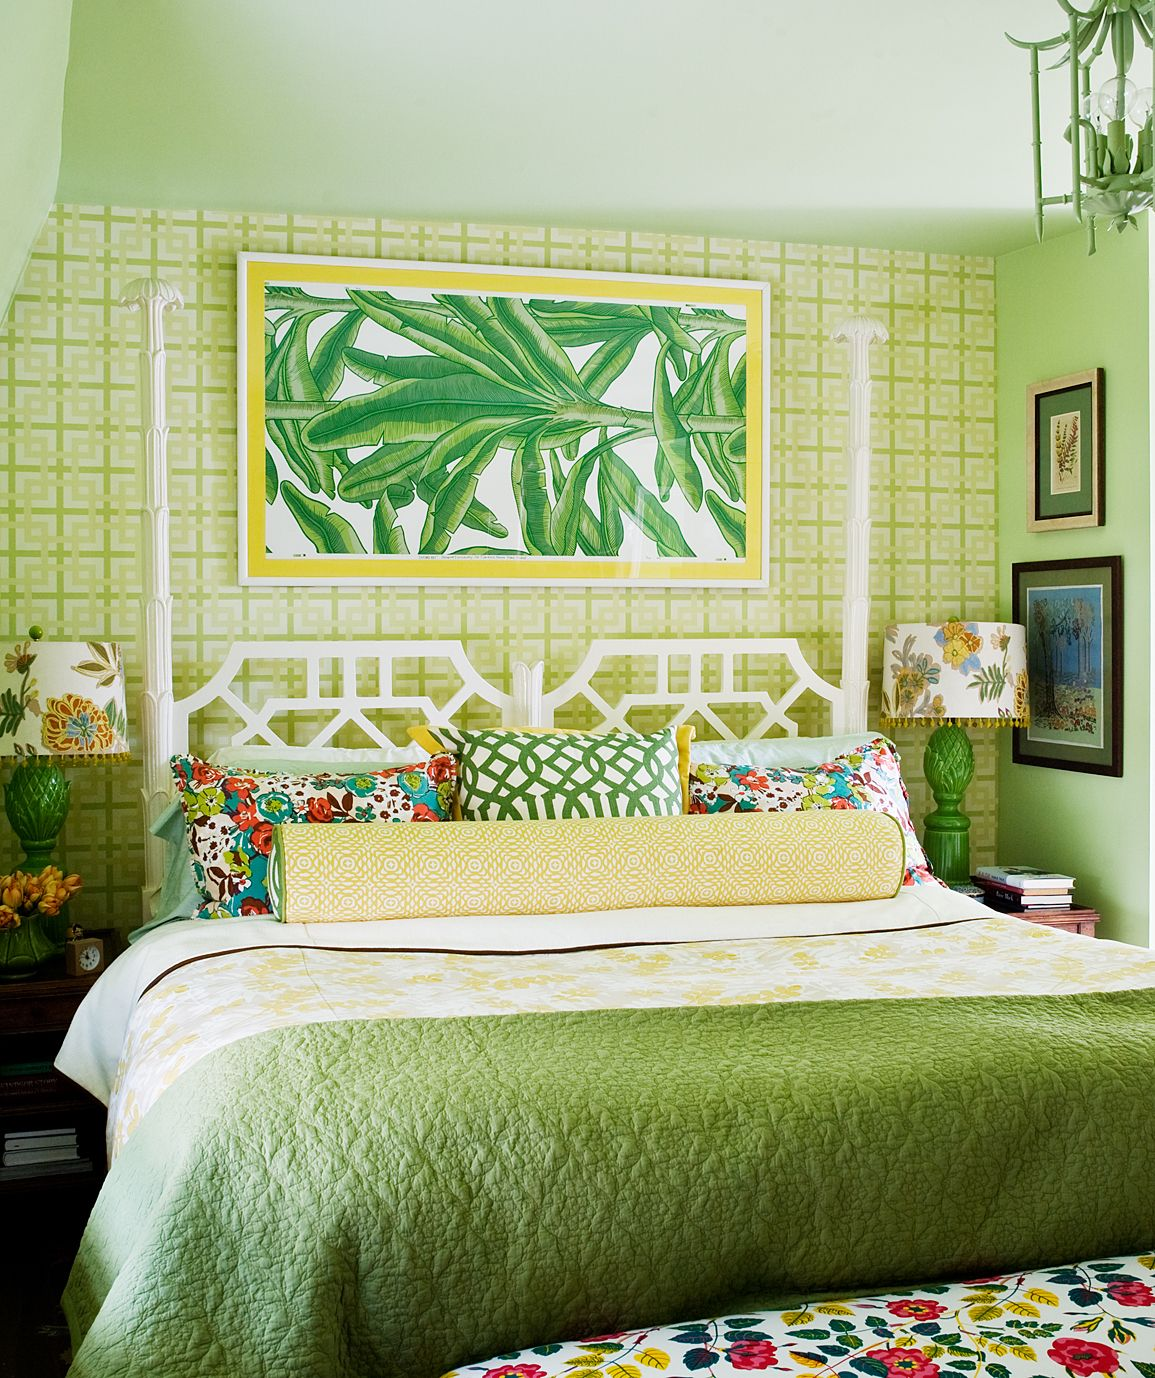 Tropical Beach House Interior: Tropical Bedrooms, Tropical Interior